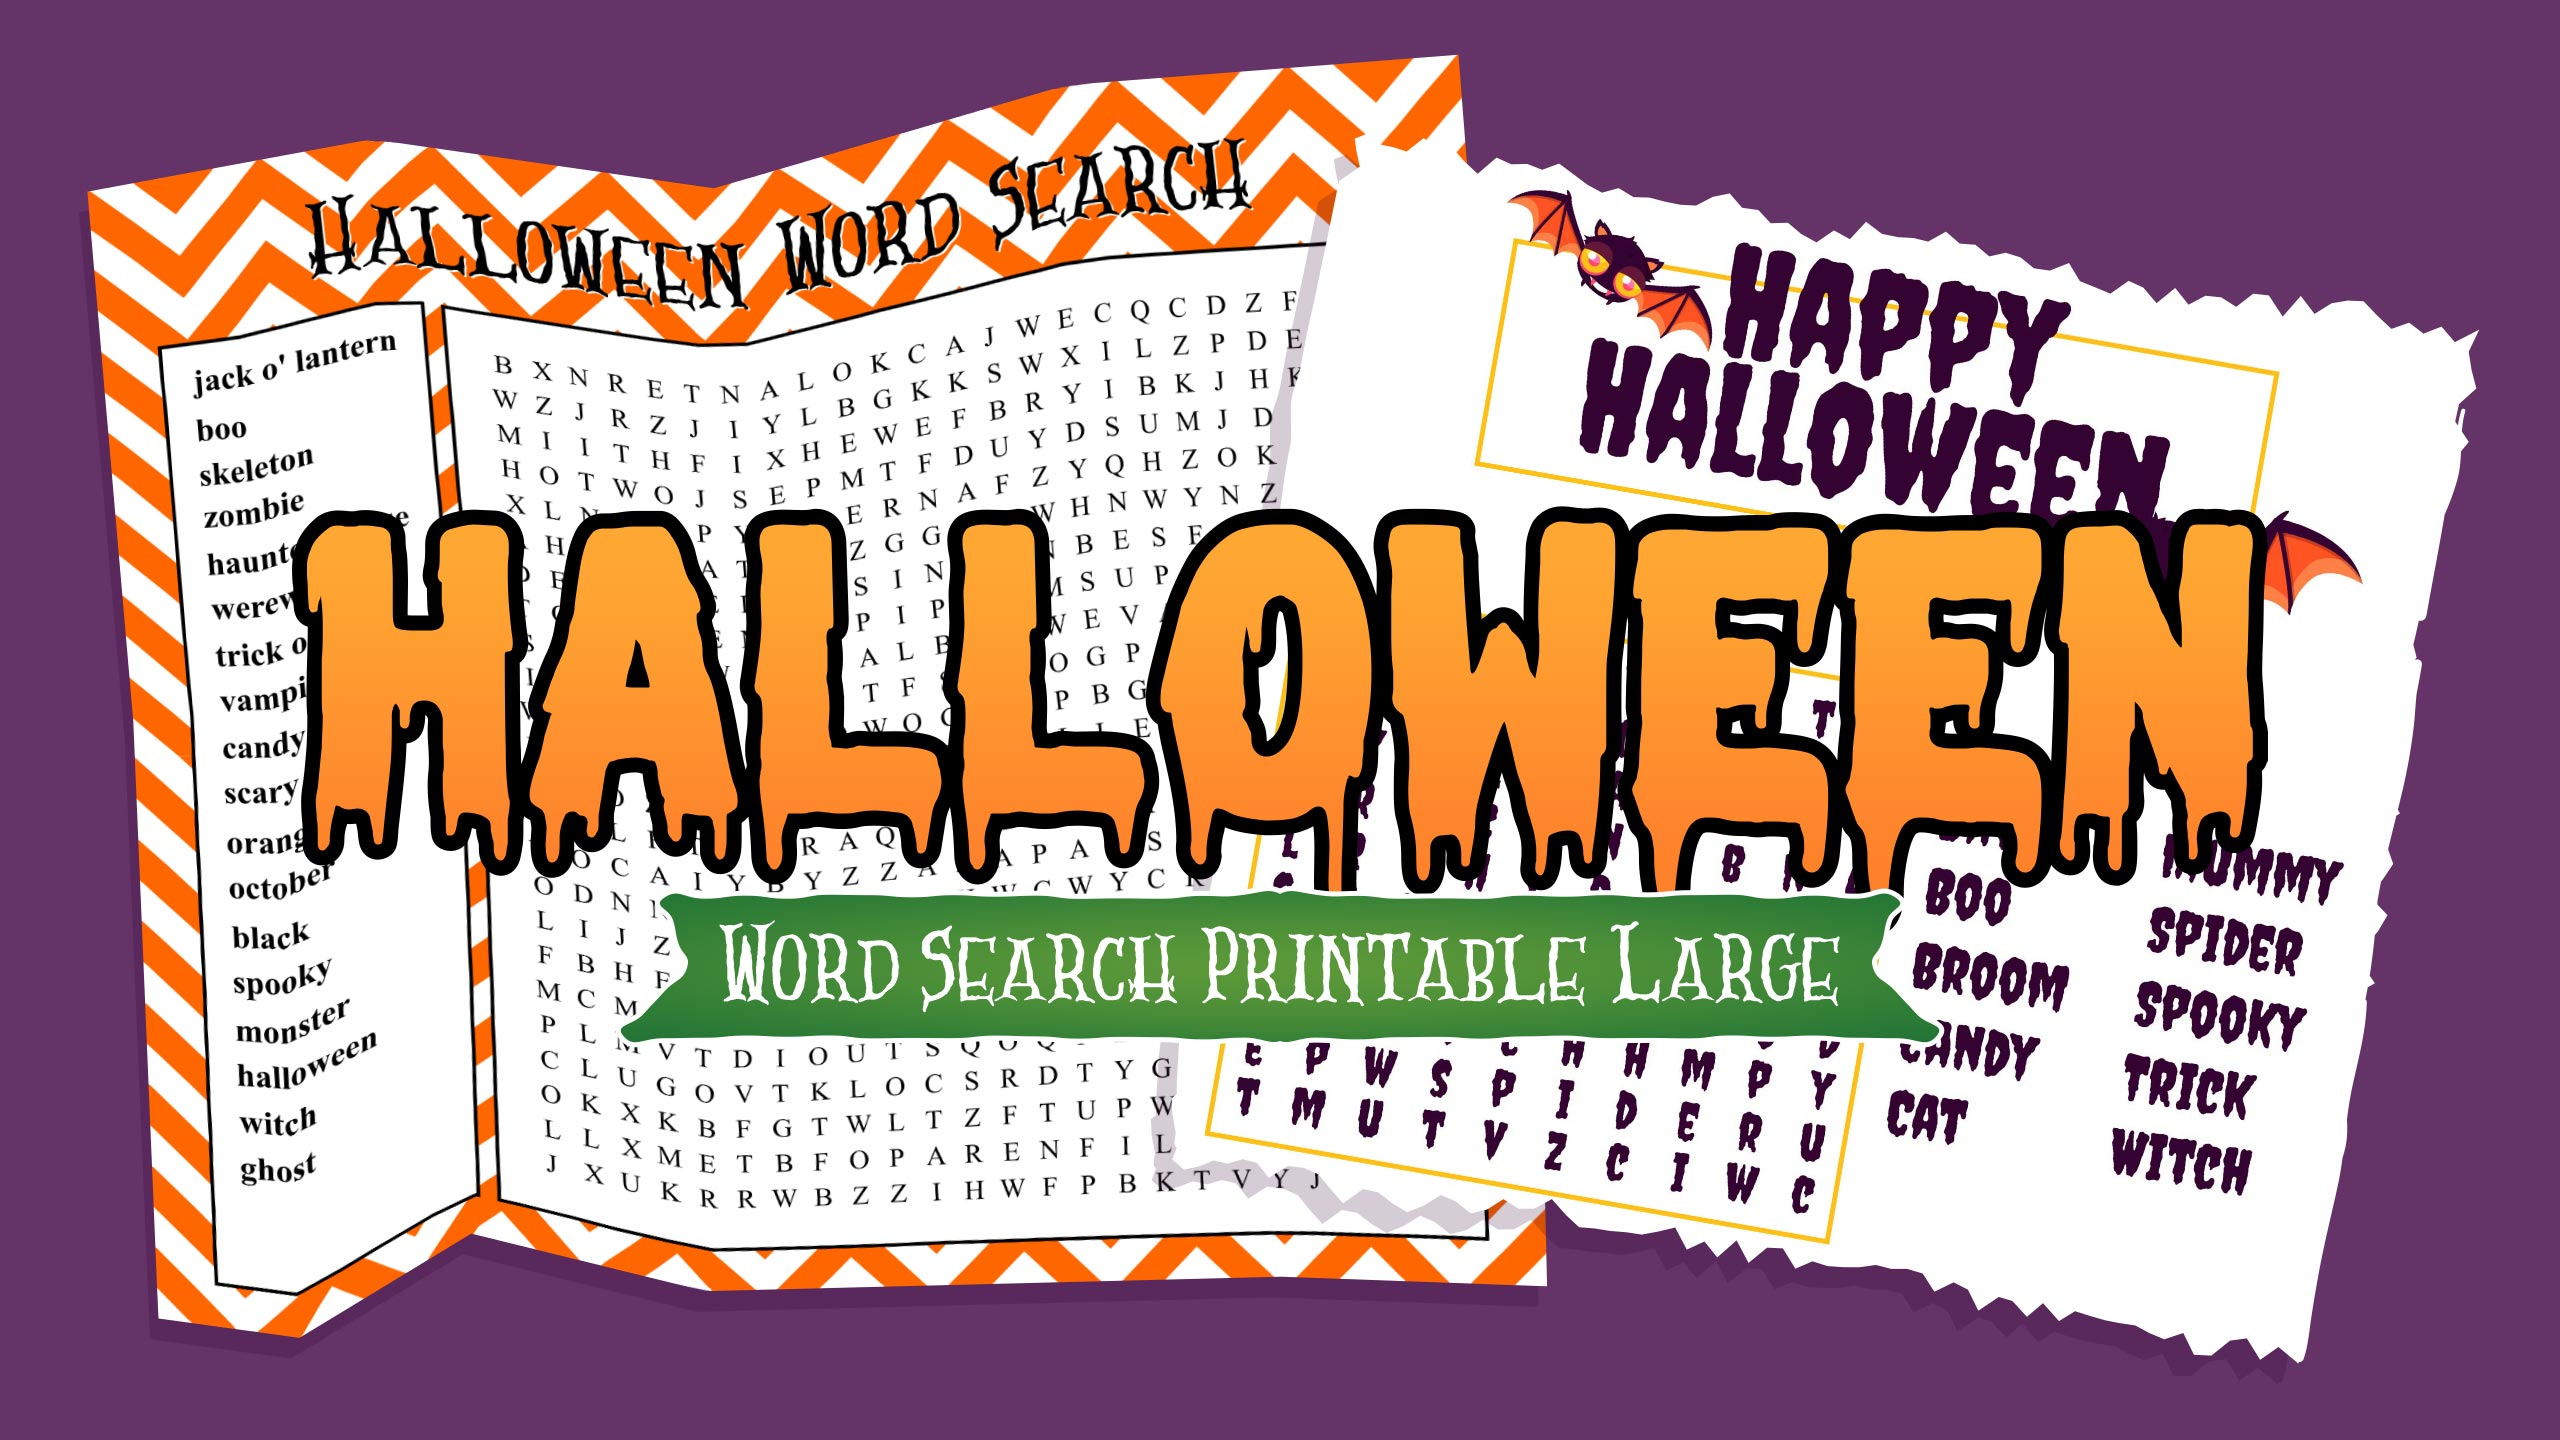 Halloween Word Search Printable Large